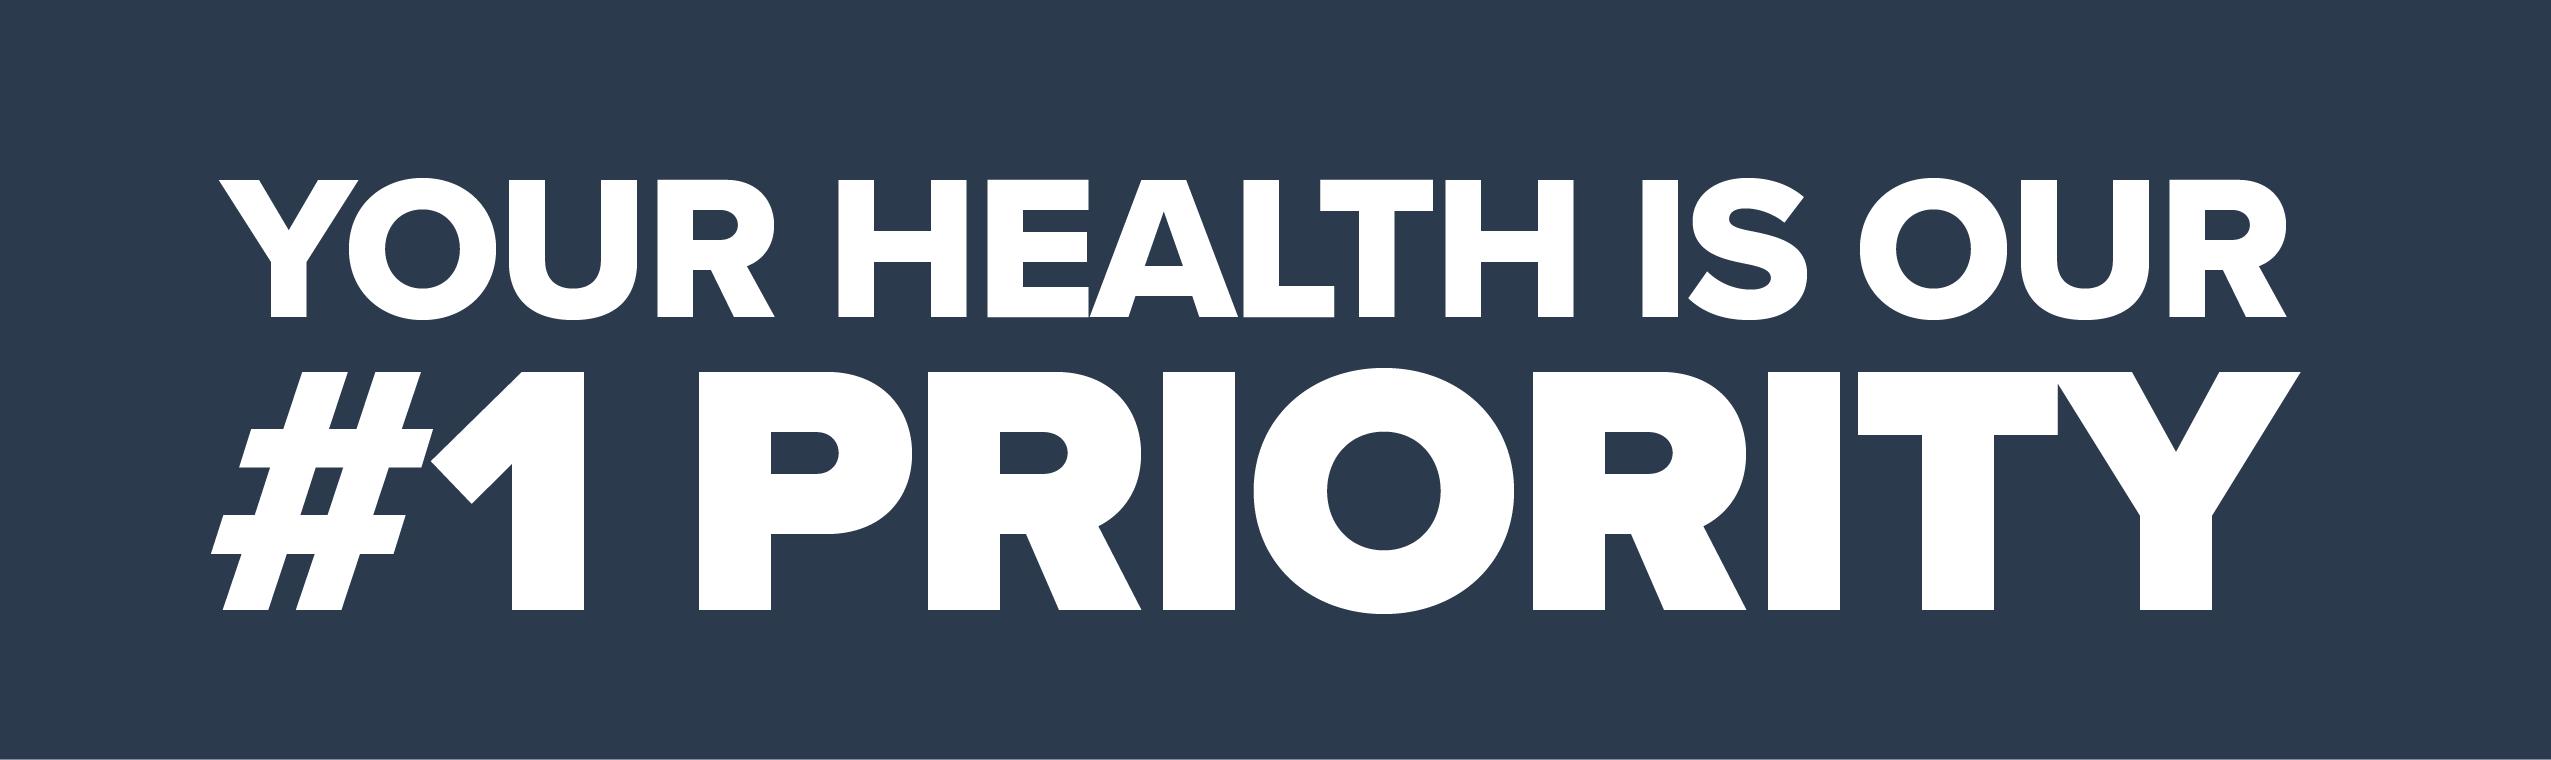 health poster custom